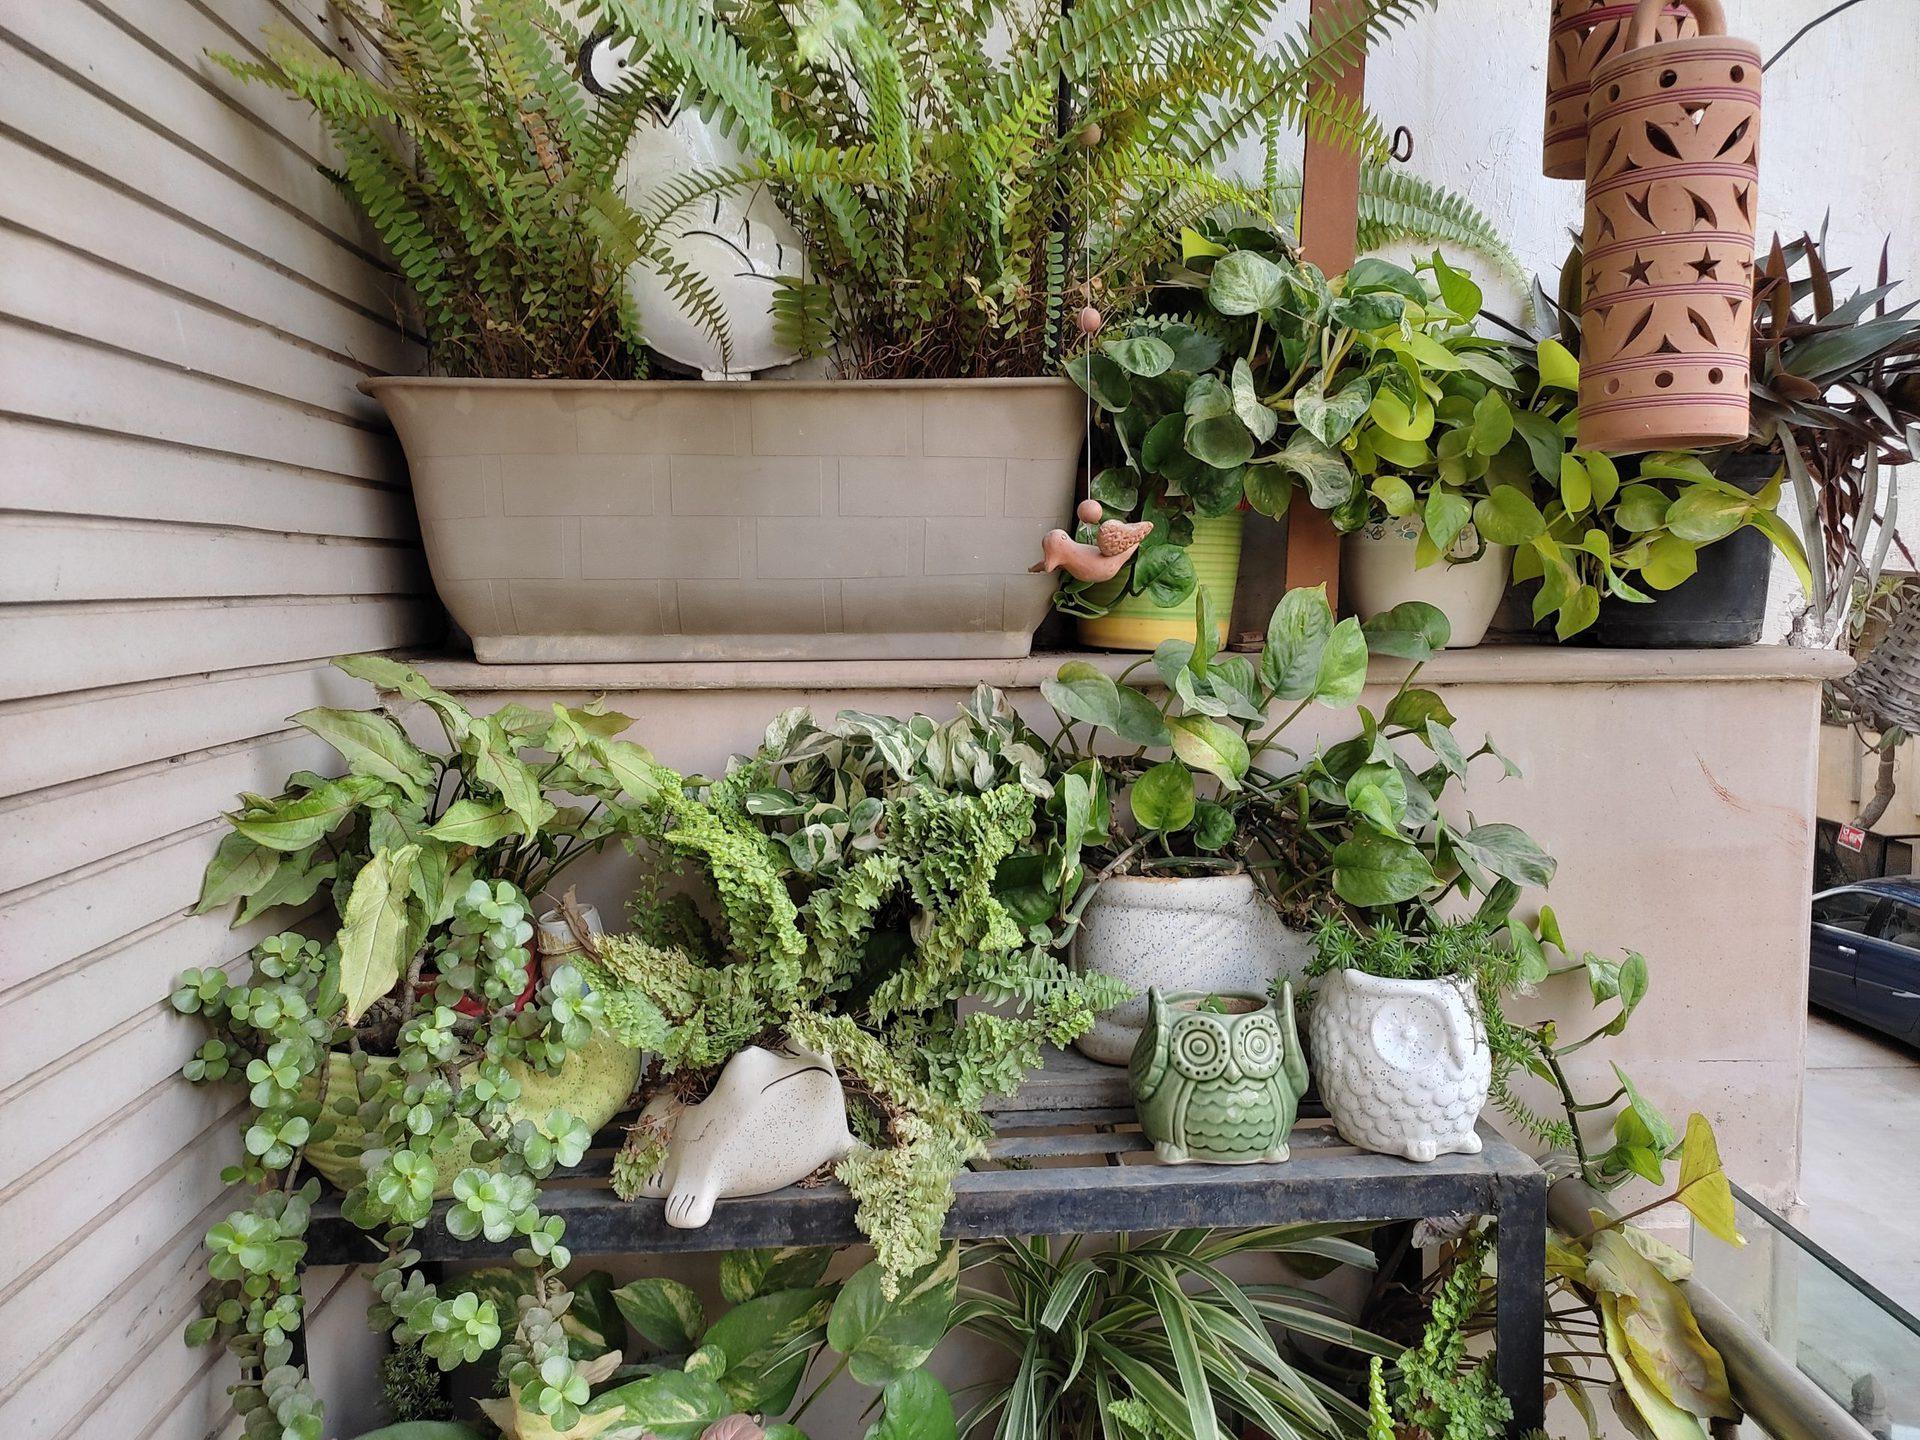 Redmi Note 10 outdoor foliage